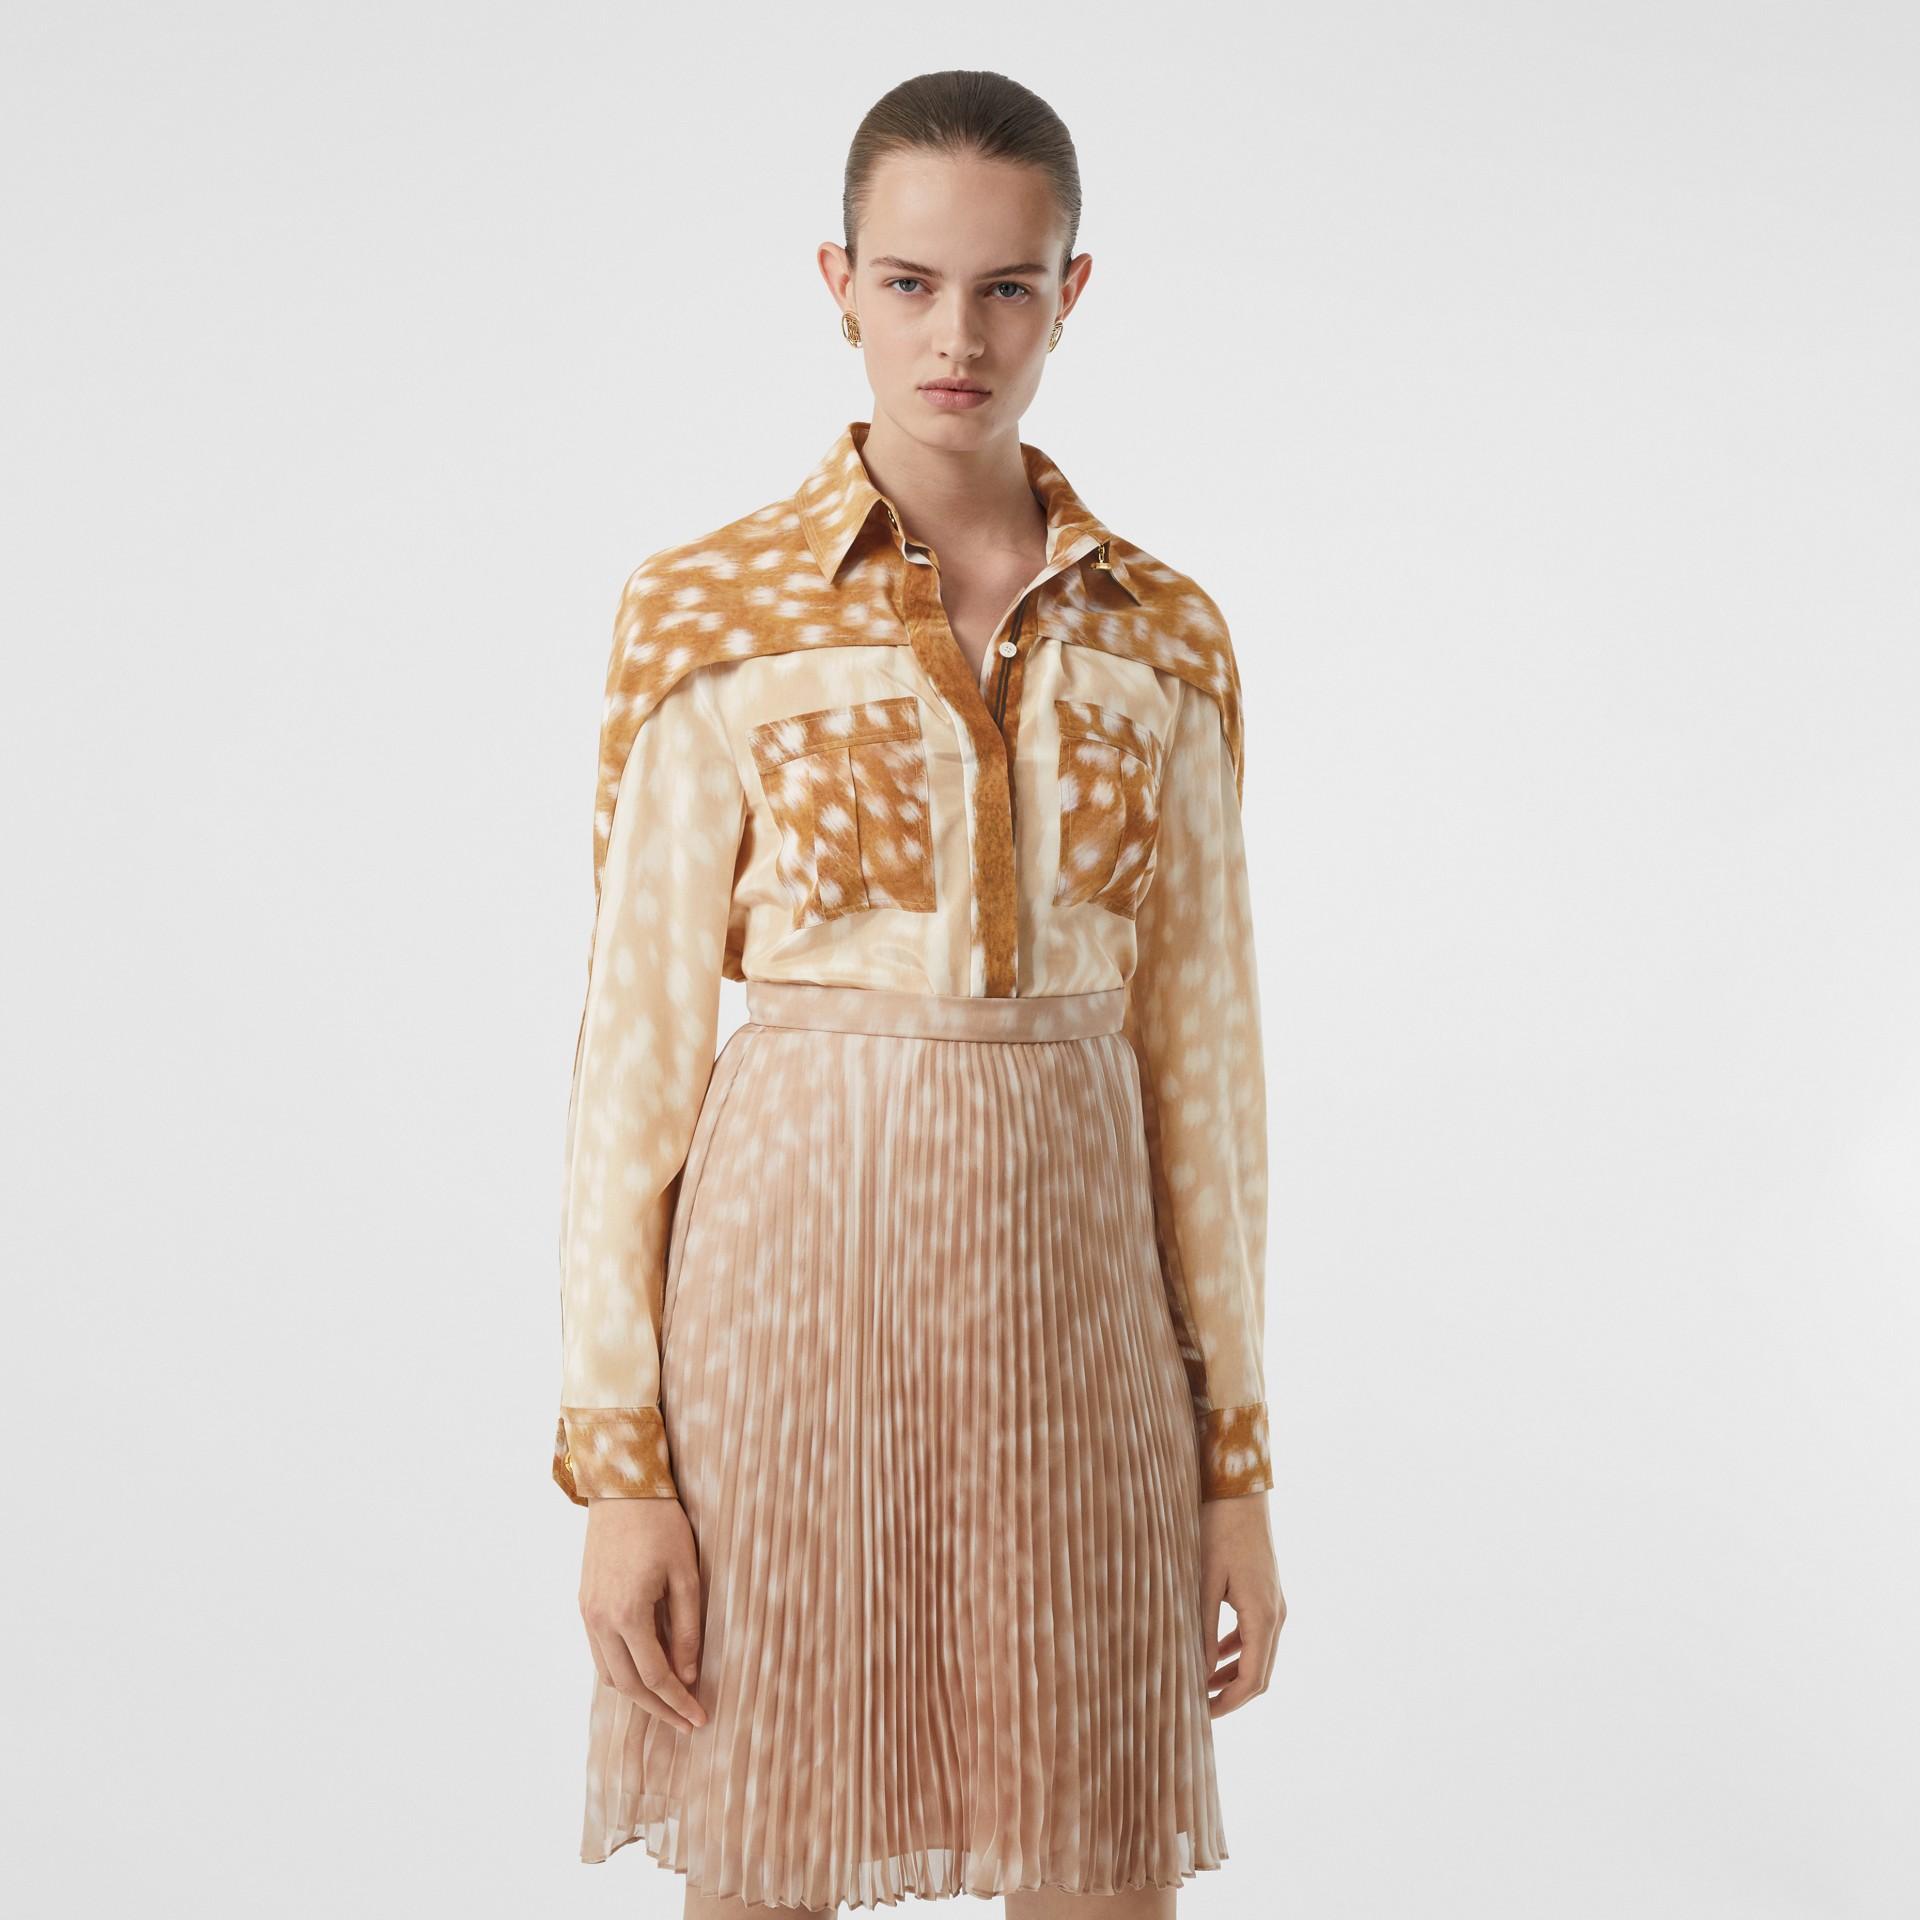 Cape Sleeve Deer Print Silk Shirt in Soft Fawn - Women | Burberry Canada - gallery image 5